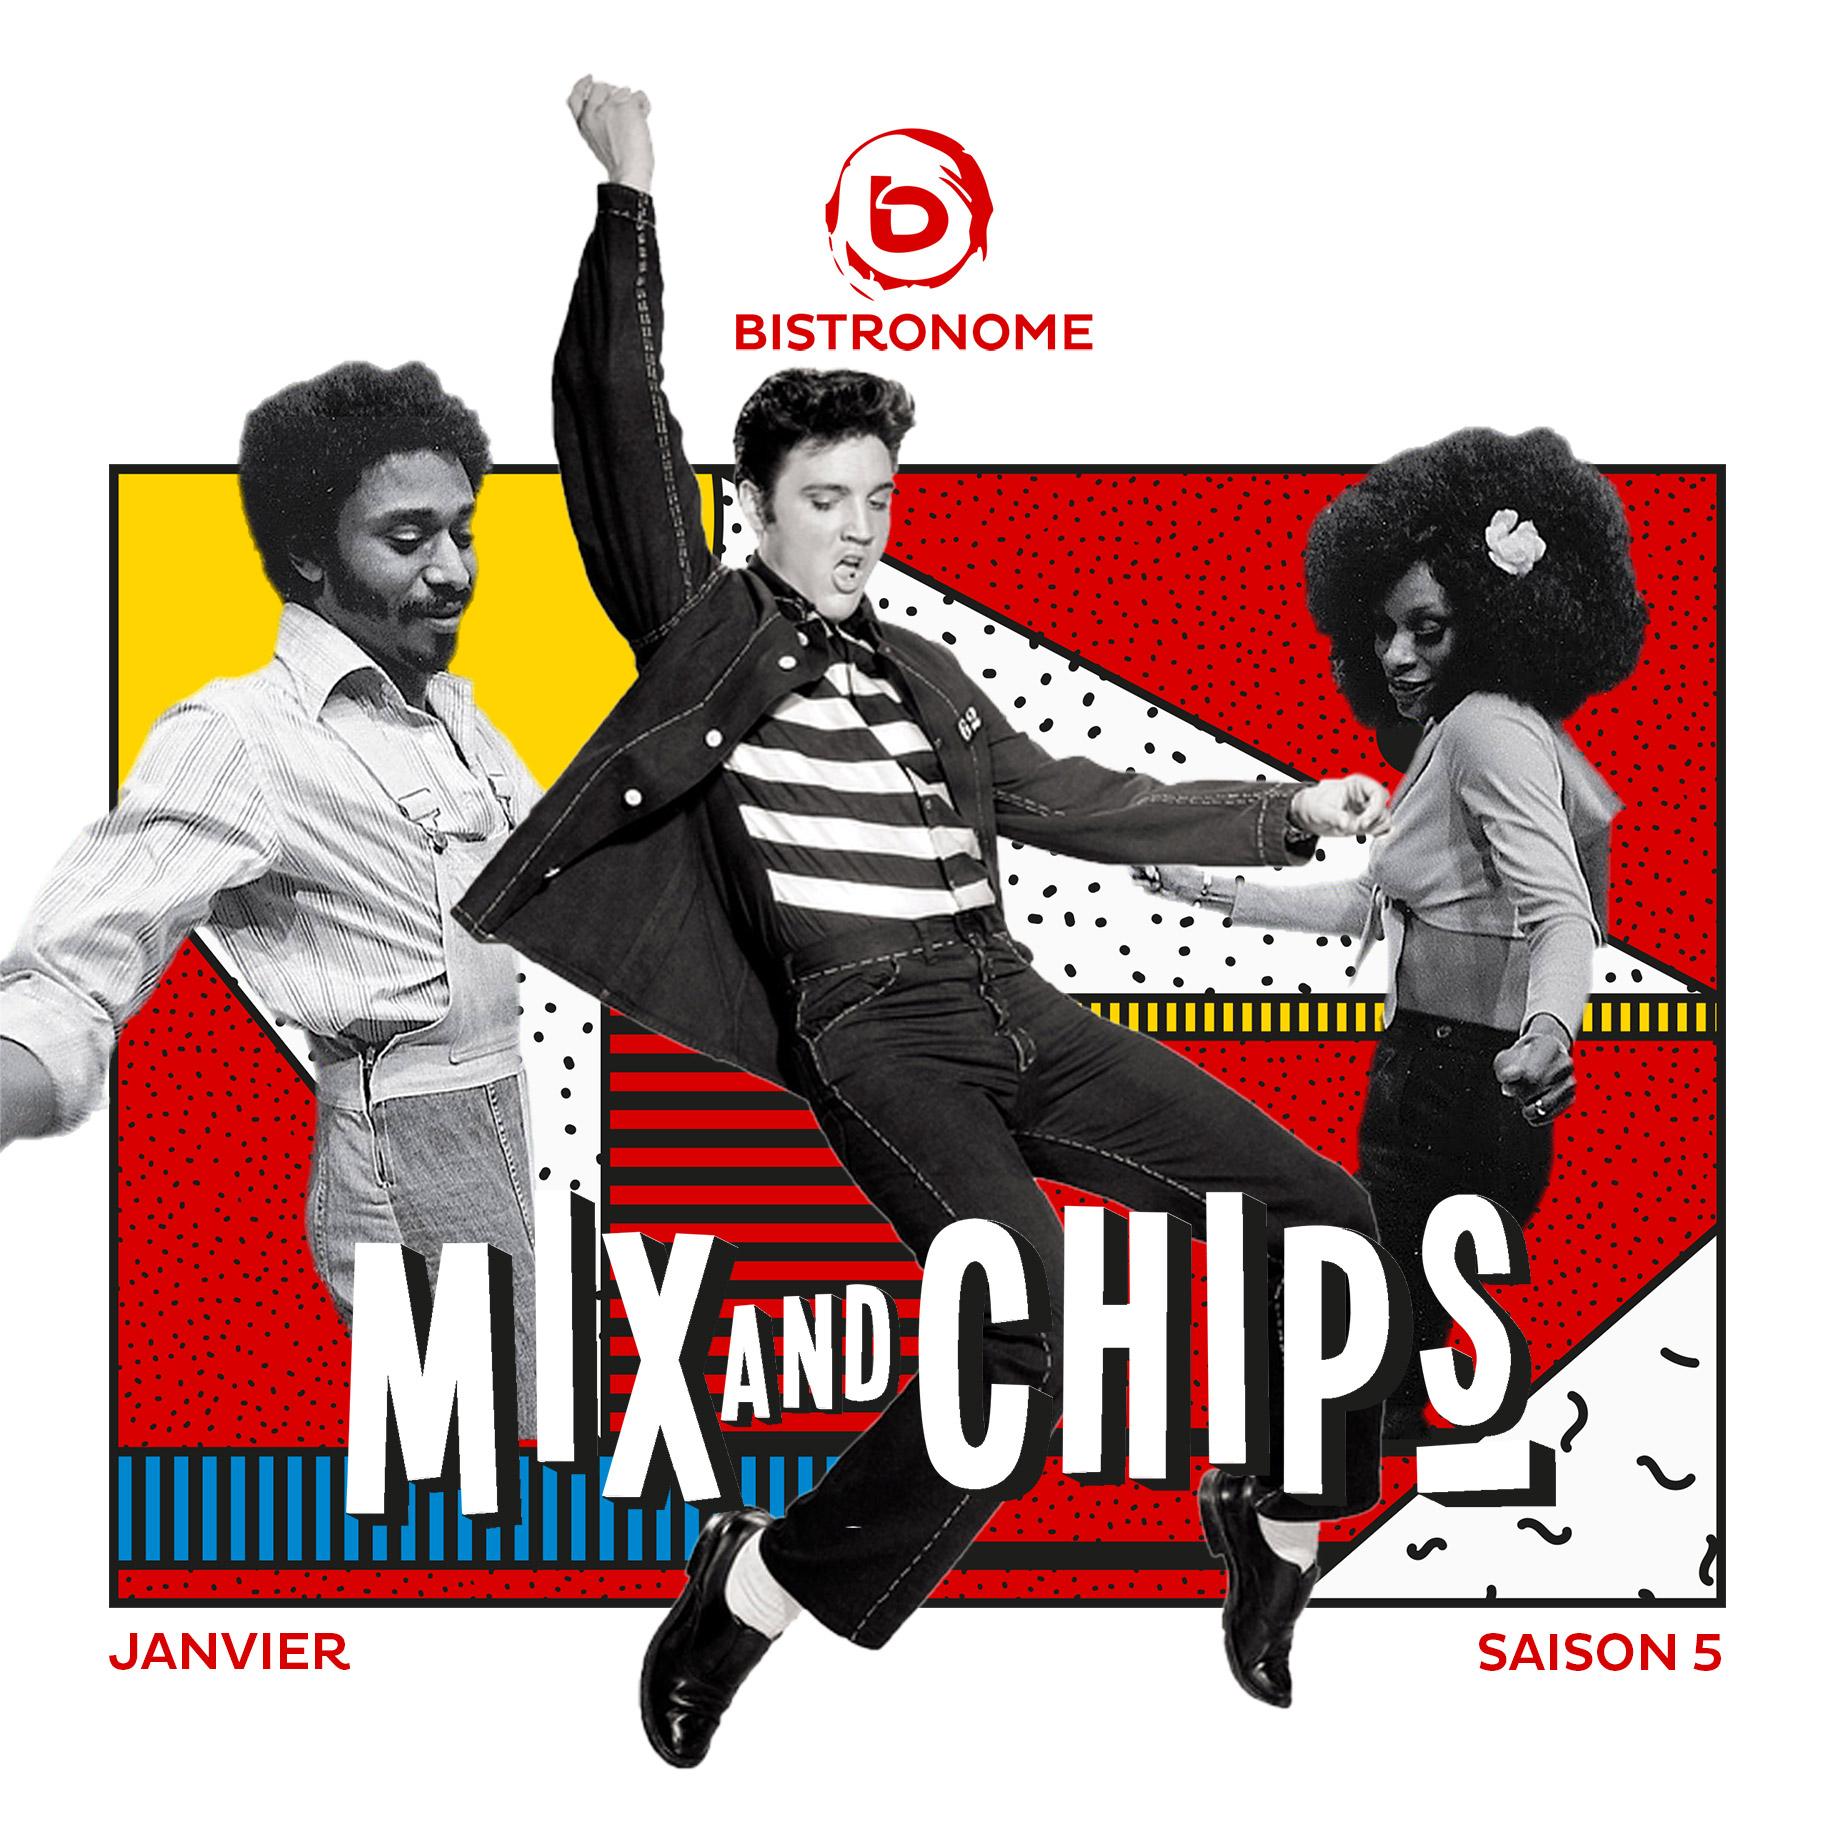 Mix-&-Chips-Saison-5-JANVIER-Recto.jpg